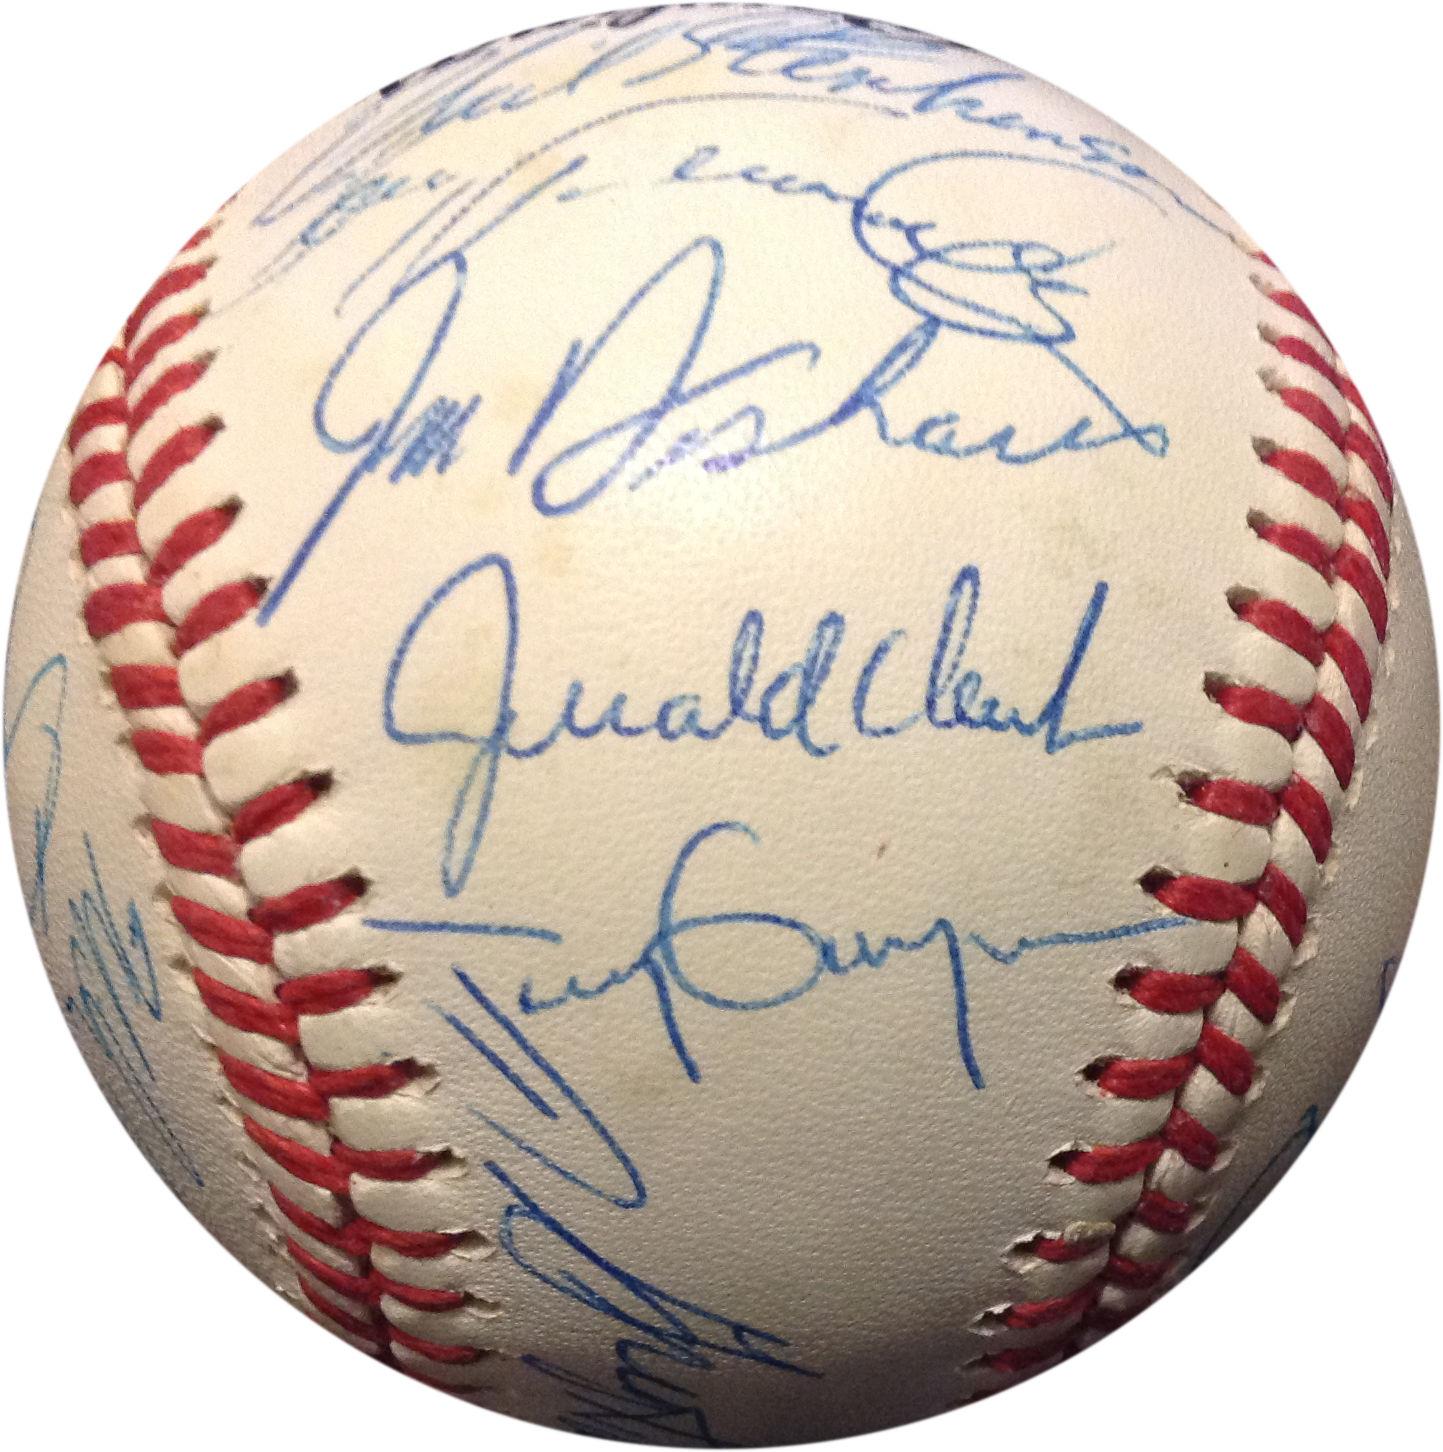 1992 San Diego Padres Team Signed NL Baseball 26 Autos Gwynn McGriff COA